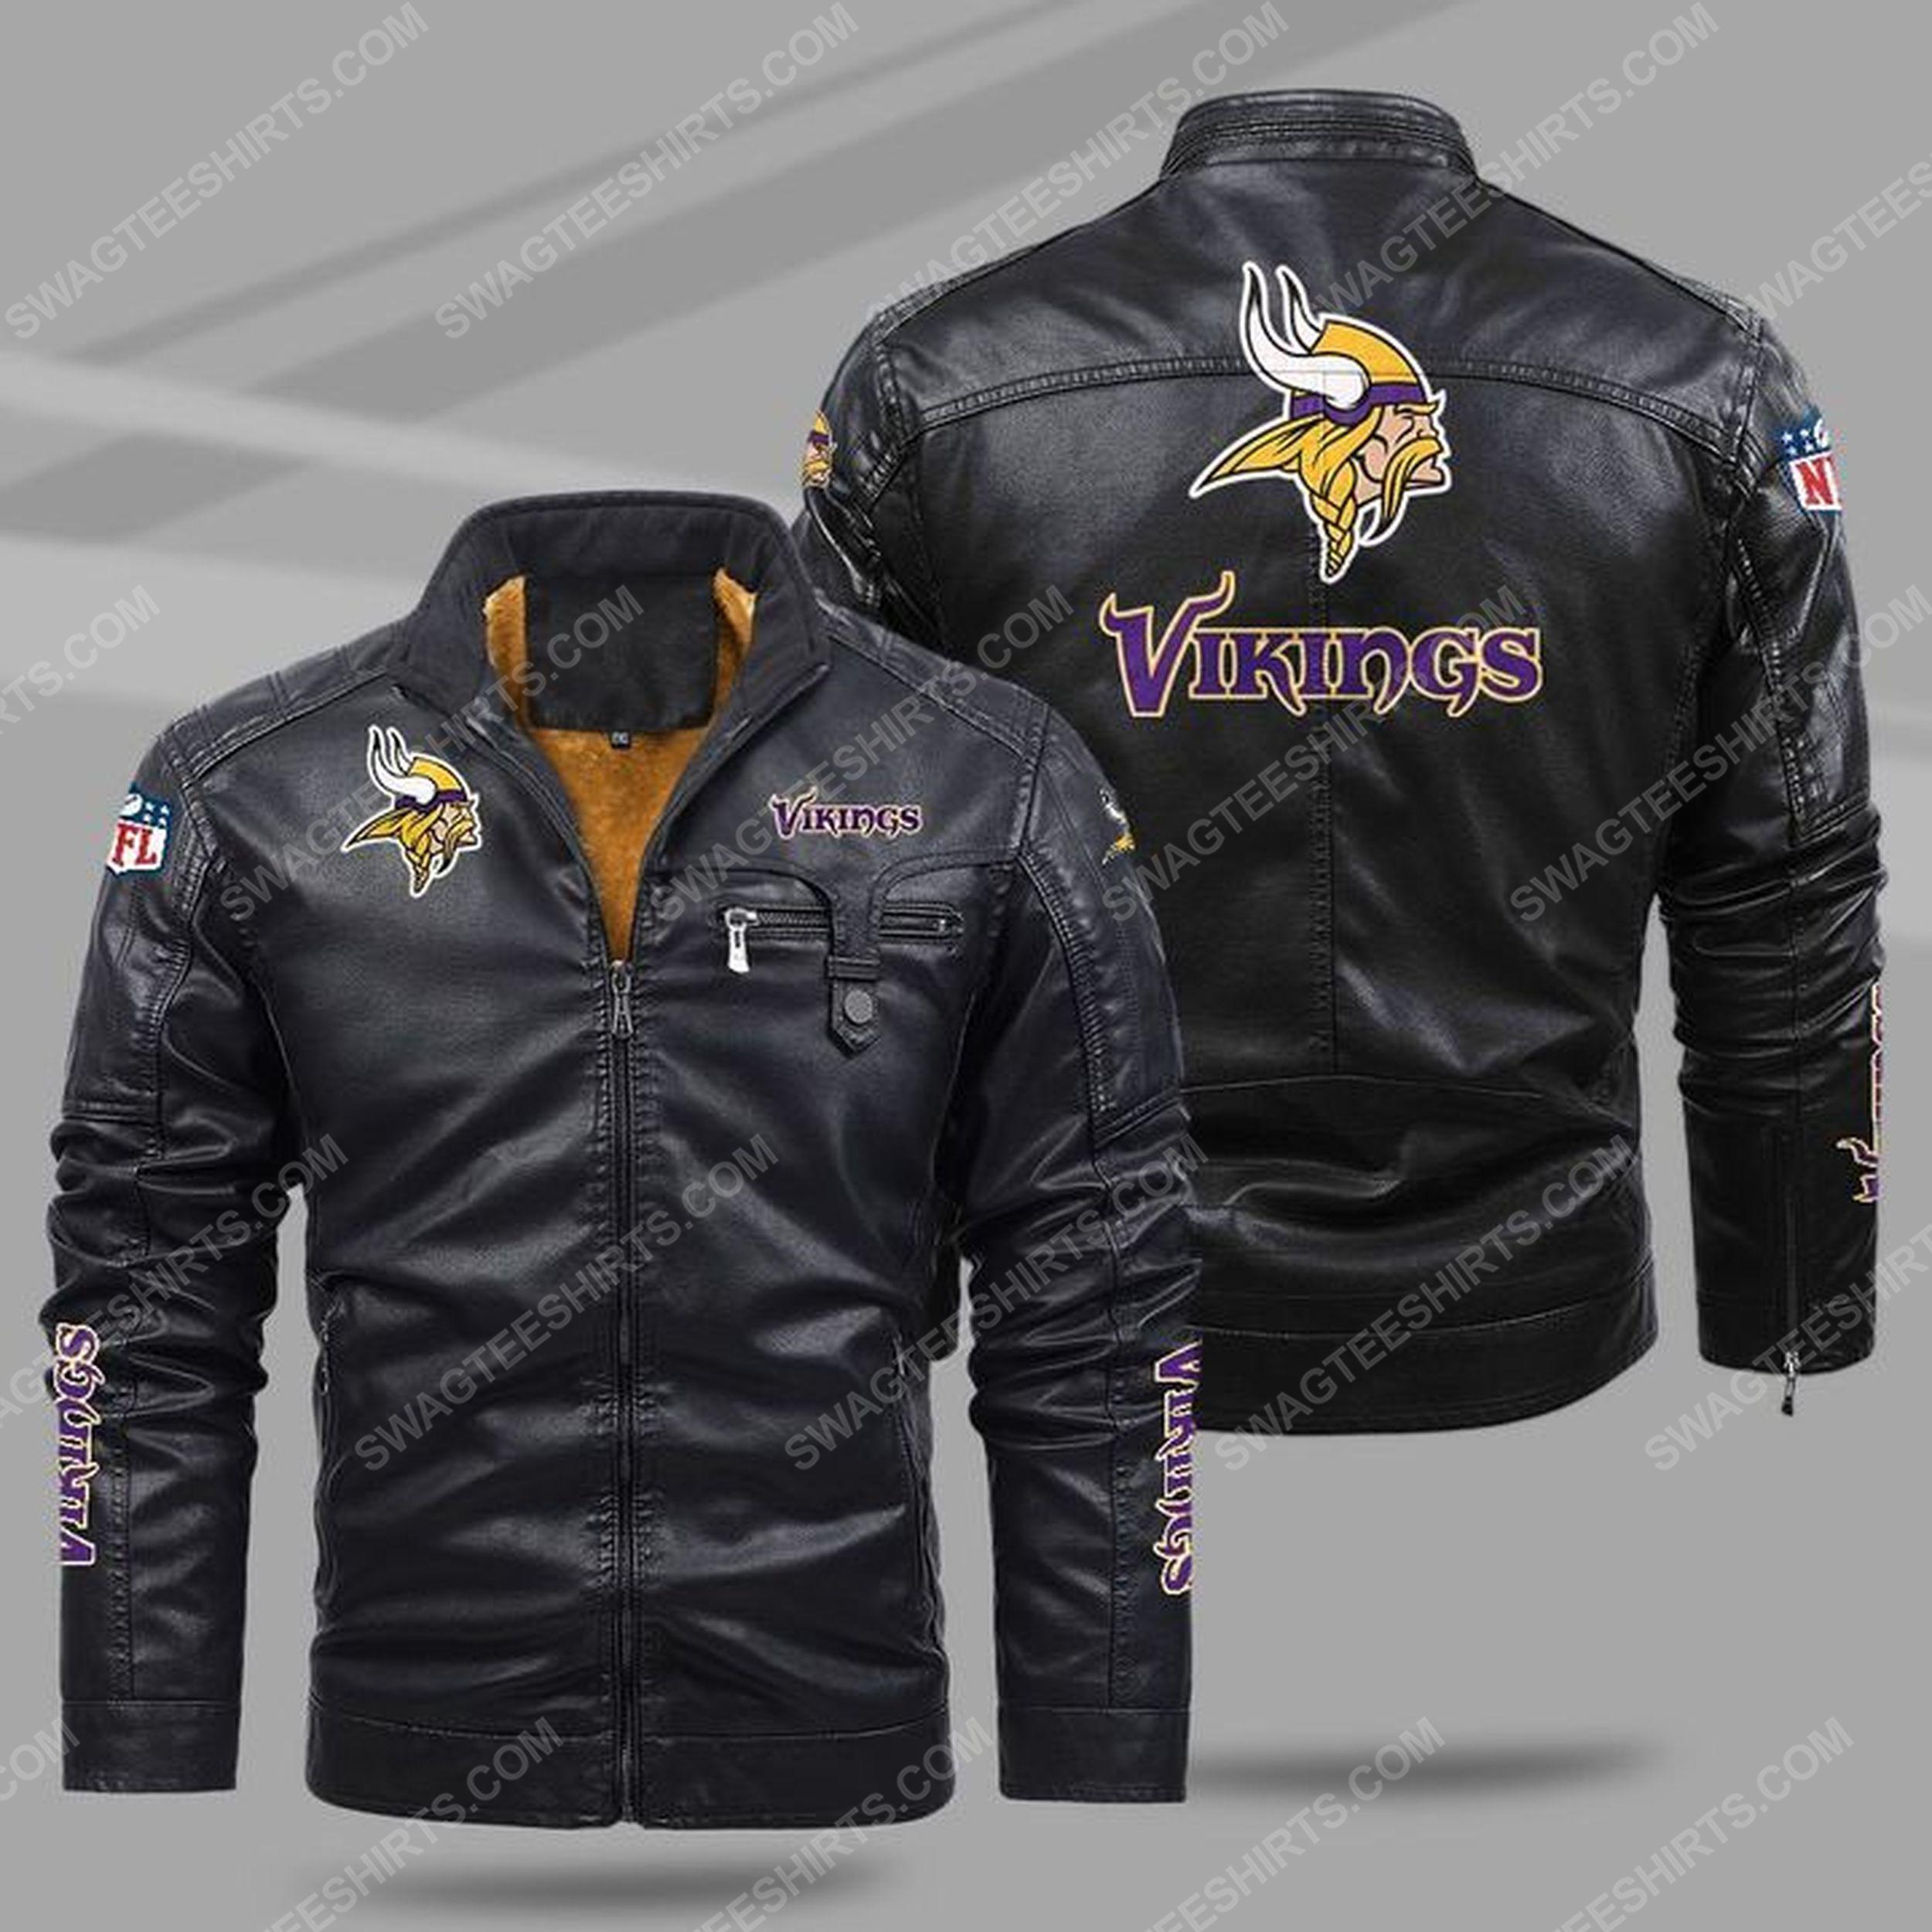 The minnesota vikings nfl all over print fleece leather jacket - black 1 - Copy